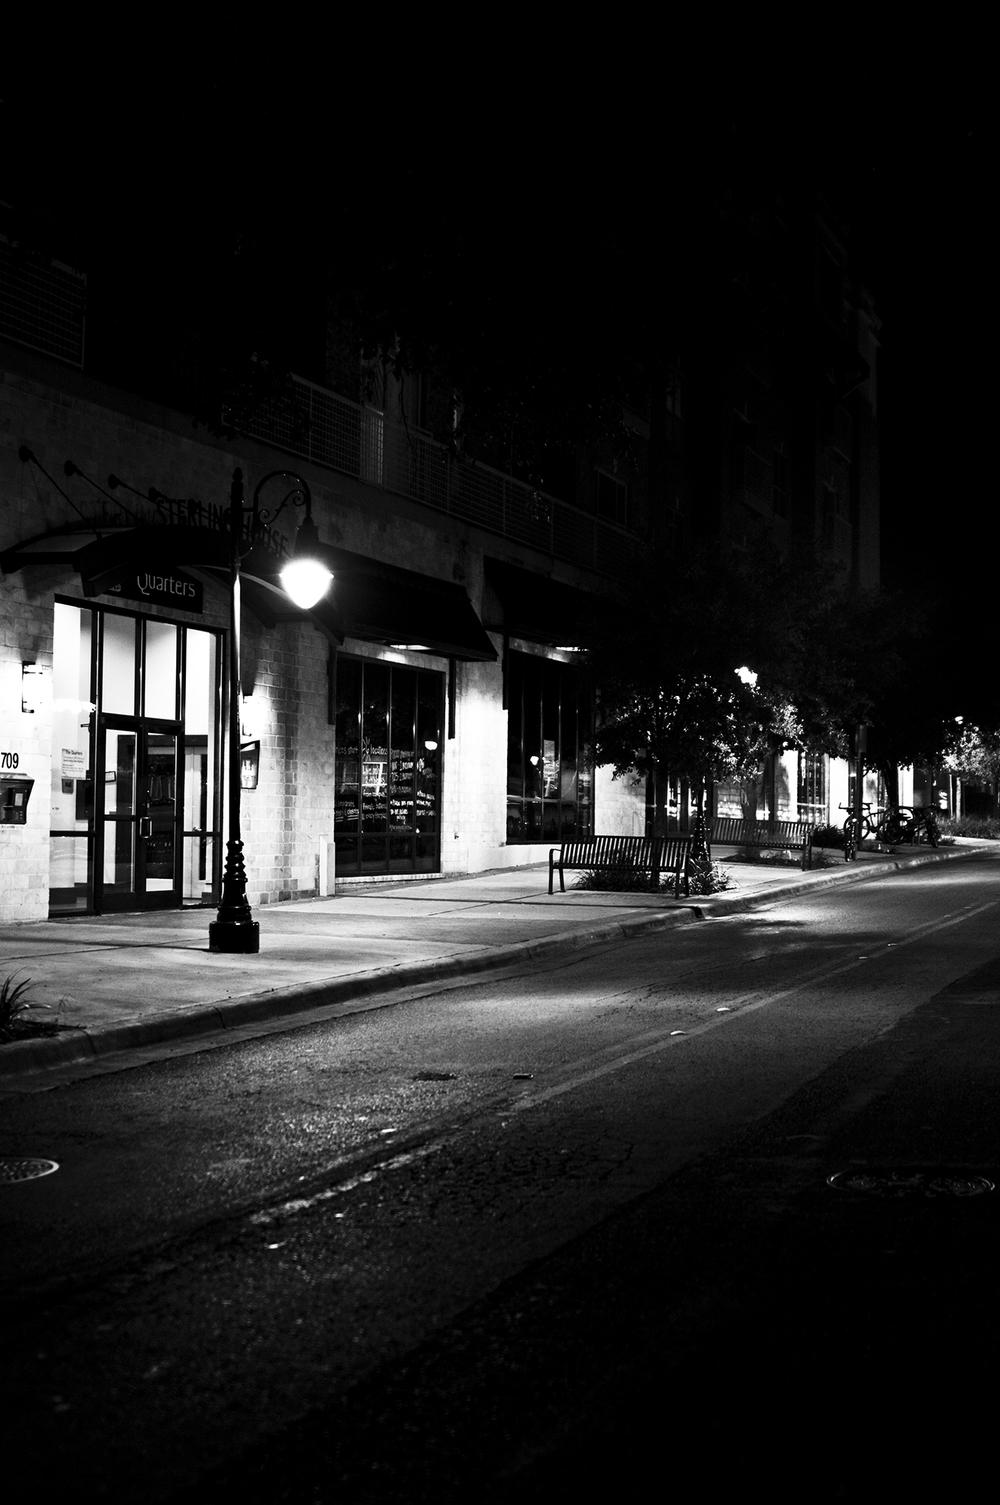 streets_4-finish.jpg